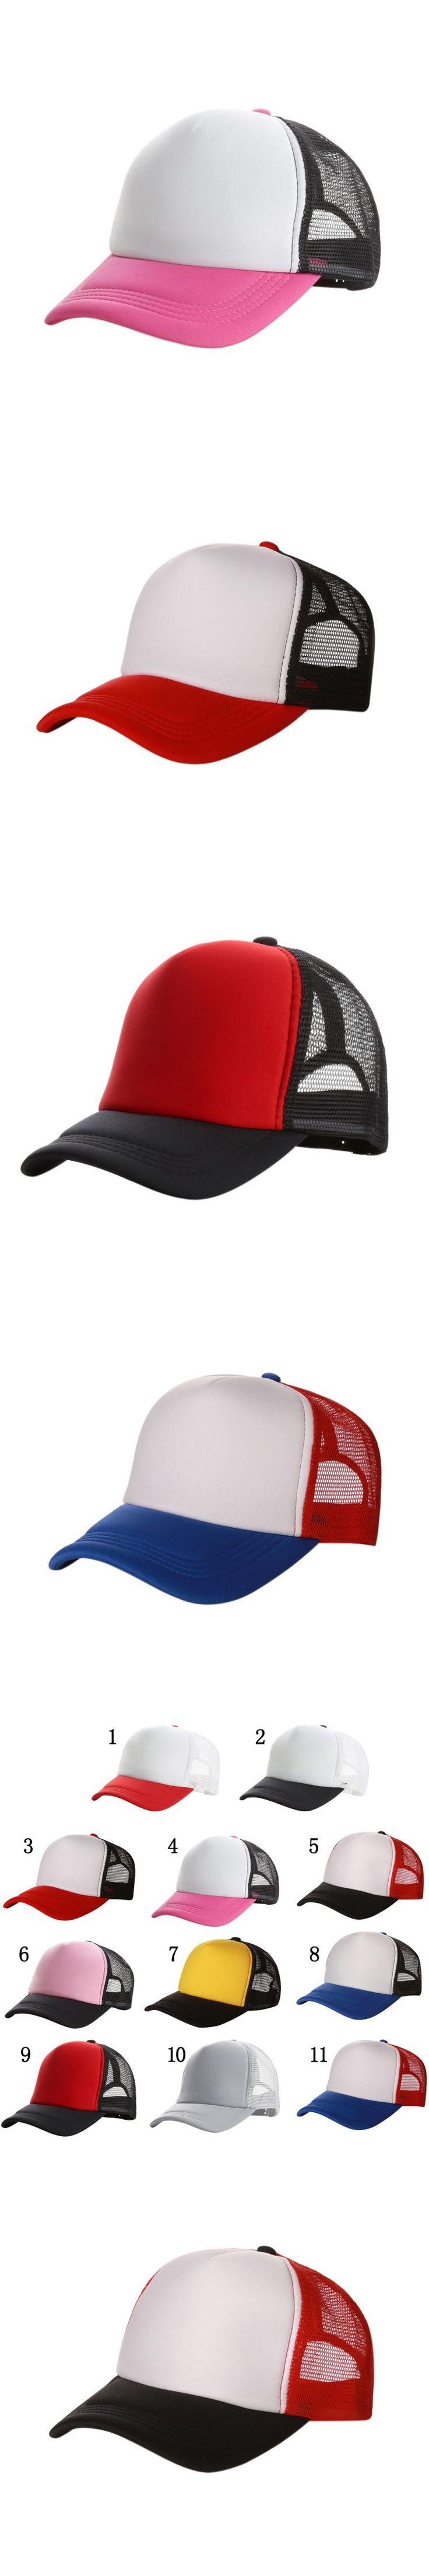 2017 Good-looking New Plain Baseball Cap Solid Trucker Mesh Blank Curved Adjustable Baseball Hat